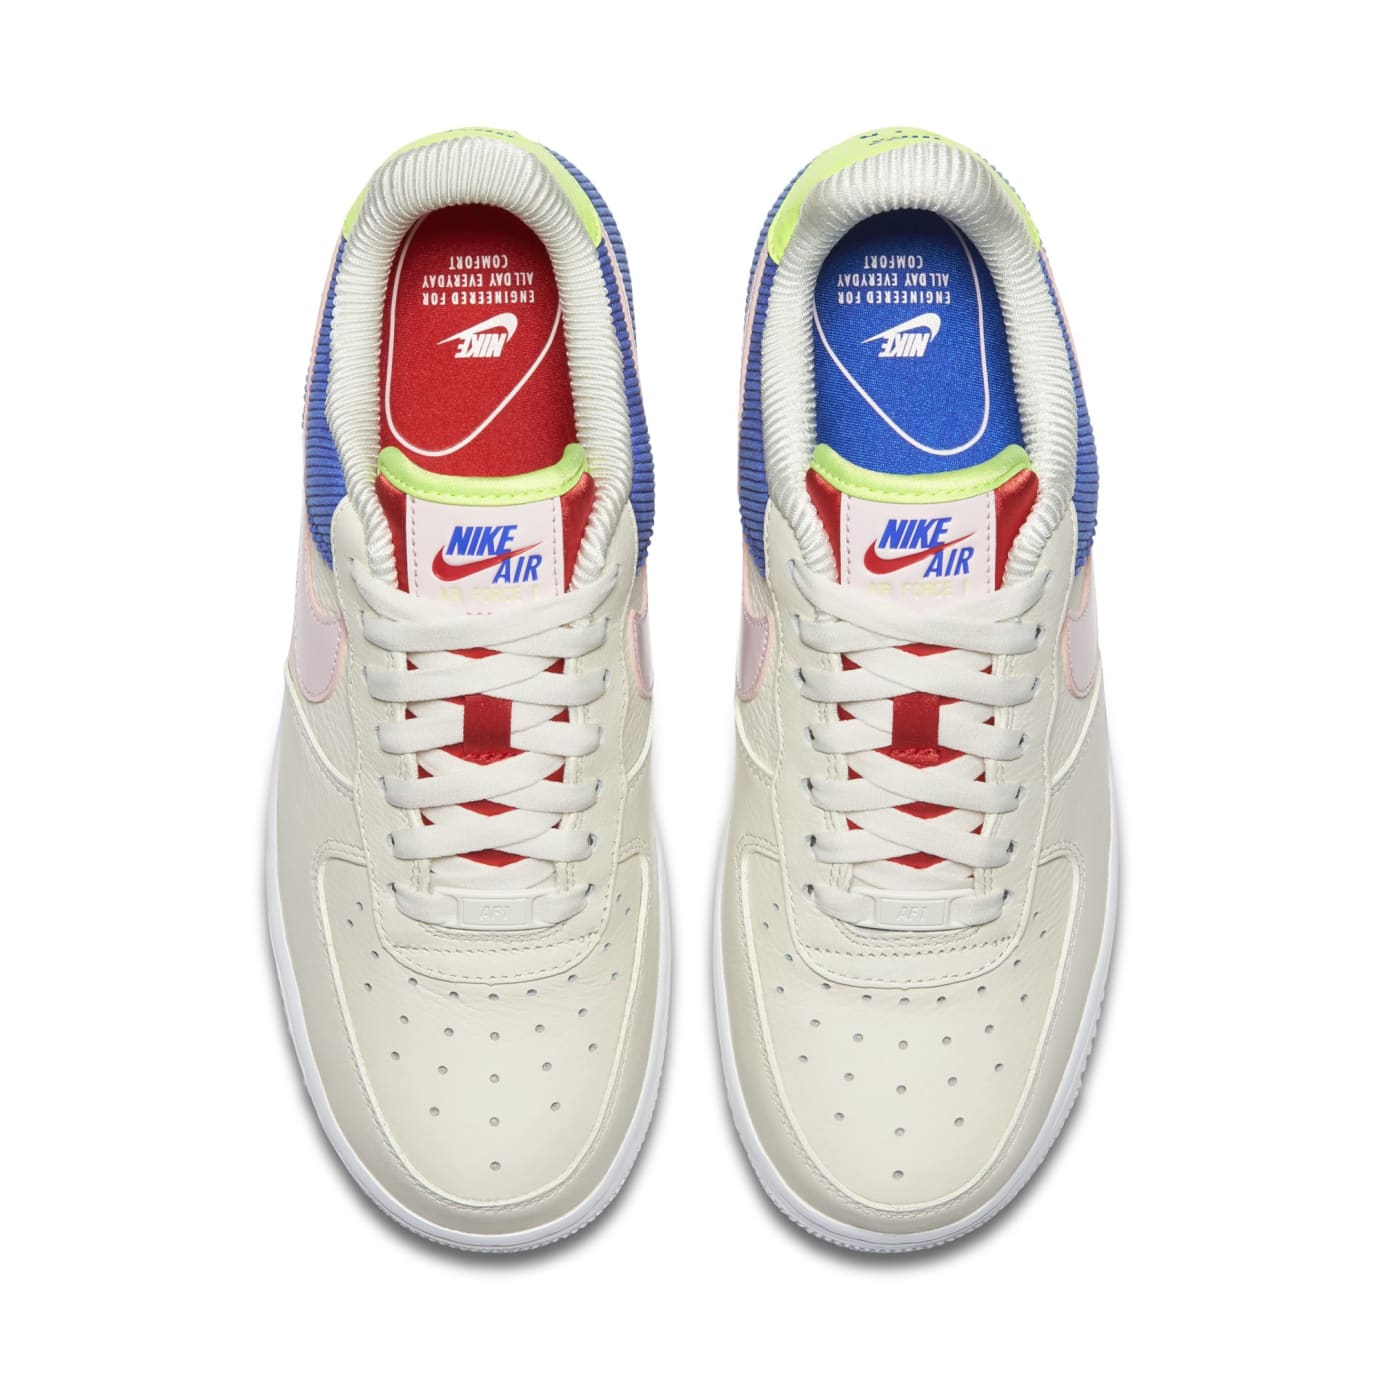 WMNS Nike Air Force 1 Panache (Top)